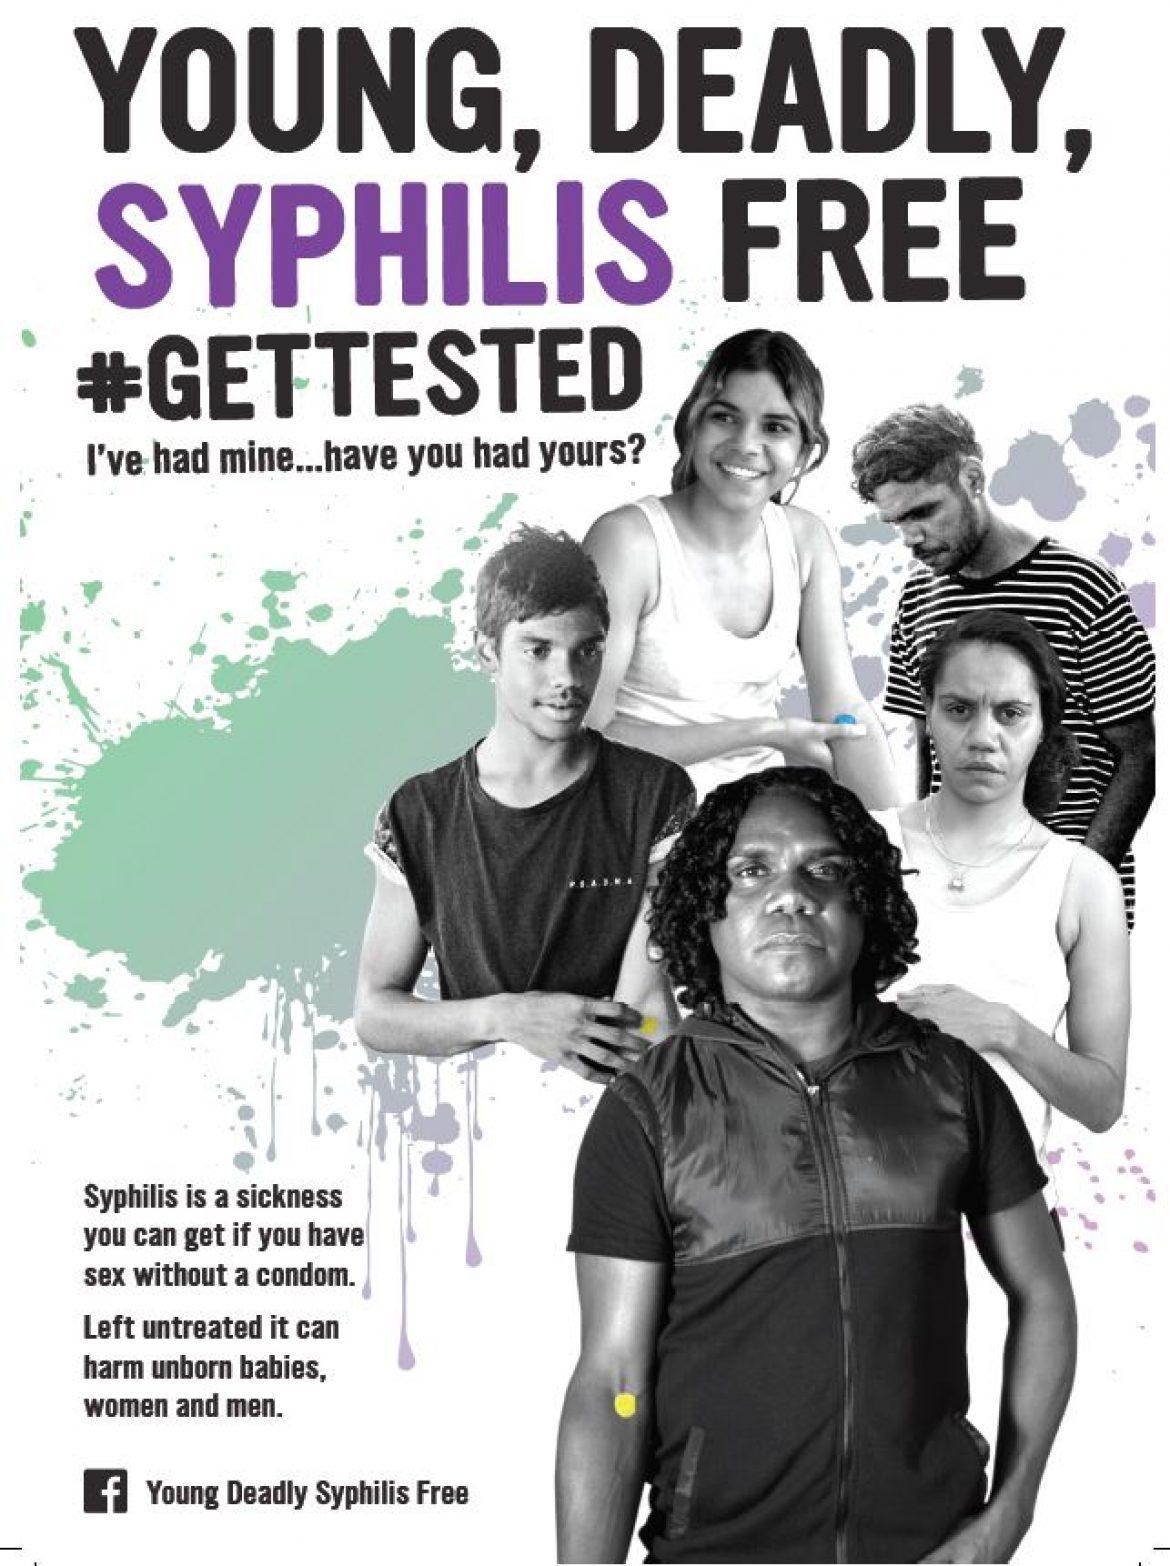 Health authorities declare syphilis outbreak has spread to Adelaide